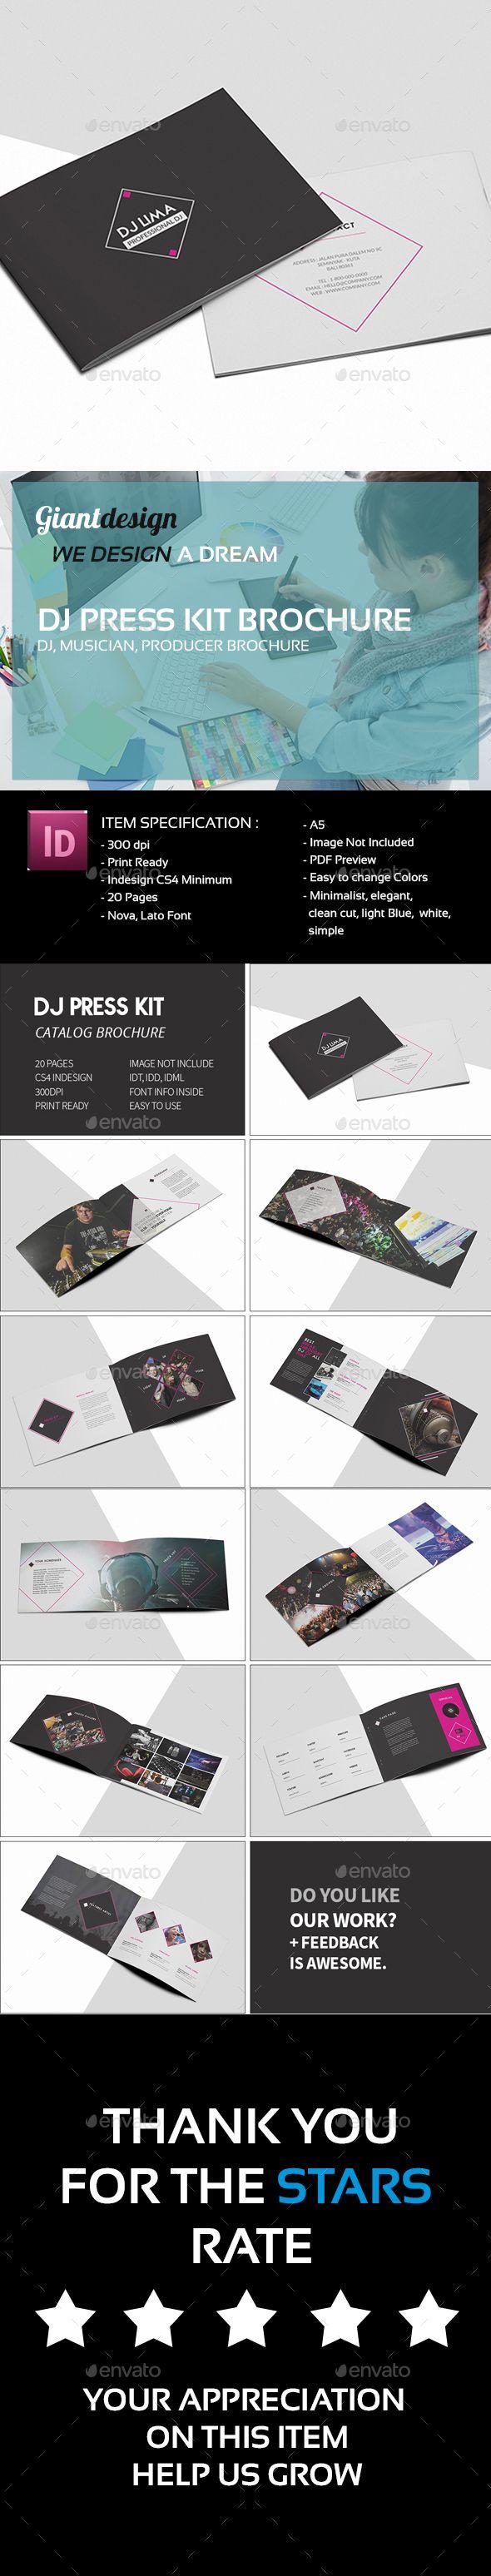 3e6b0dc77a3394e9a6102c43f34326a2  brochure template brochure design Top Result 60 Lovely Dj Biography Template Photos 2017 Kdh6